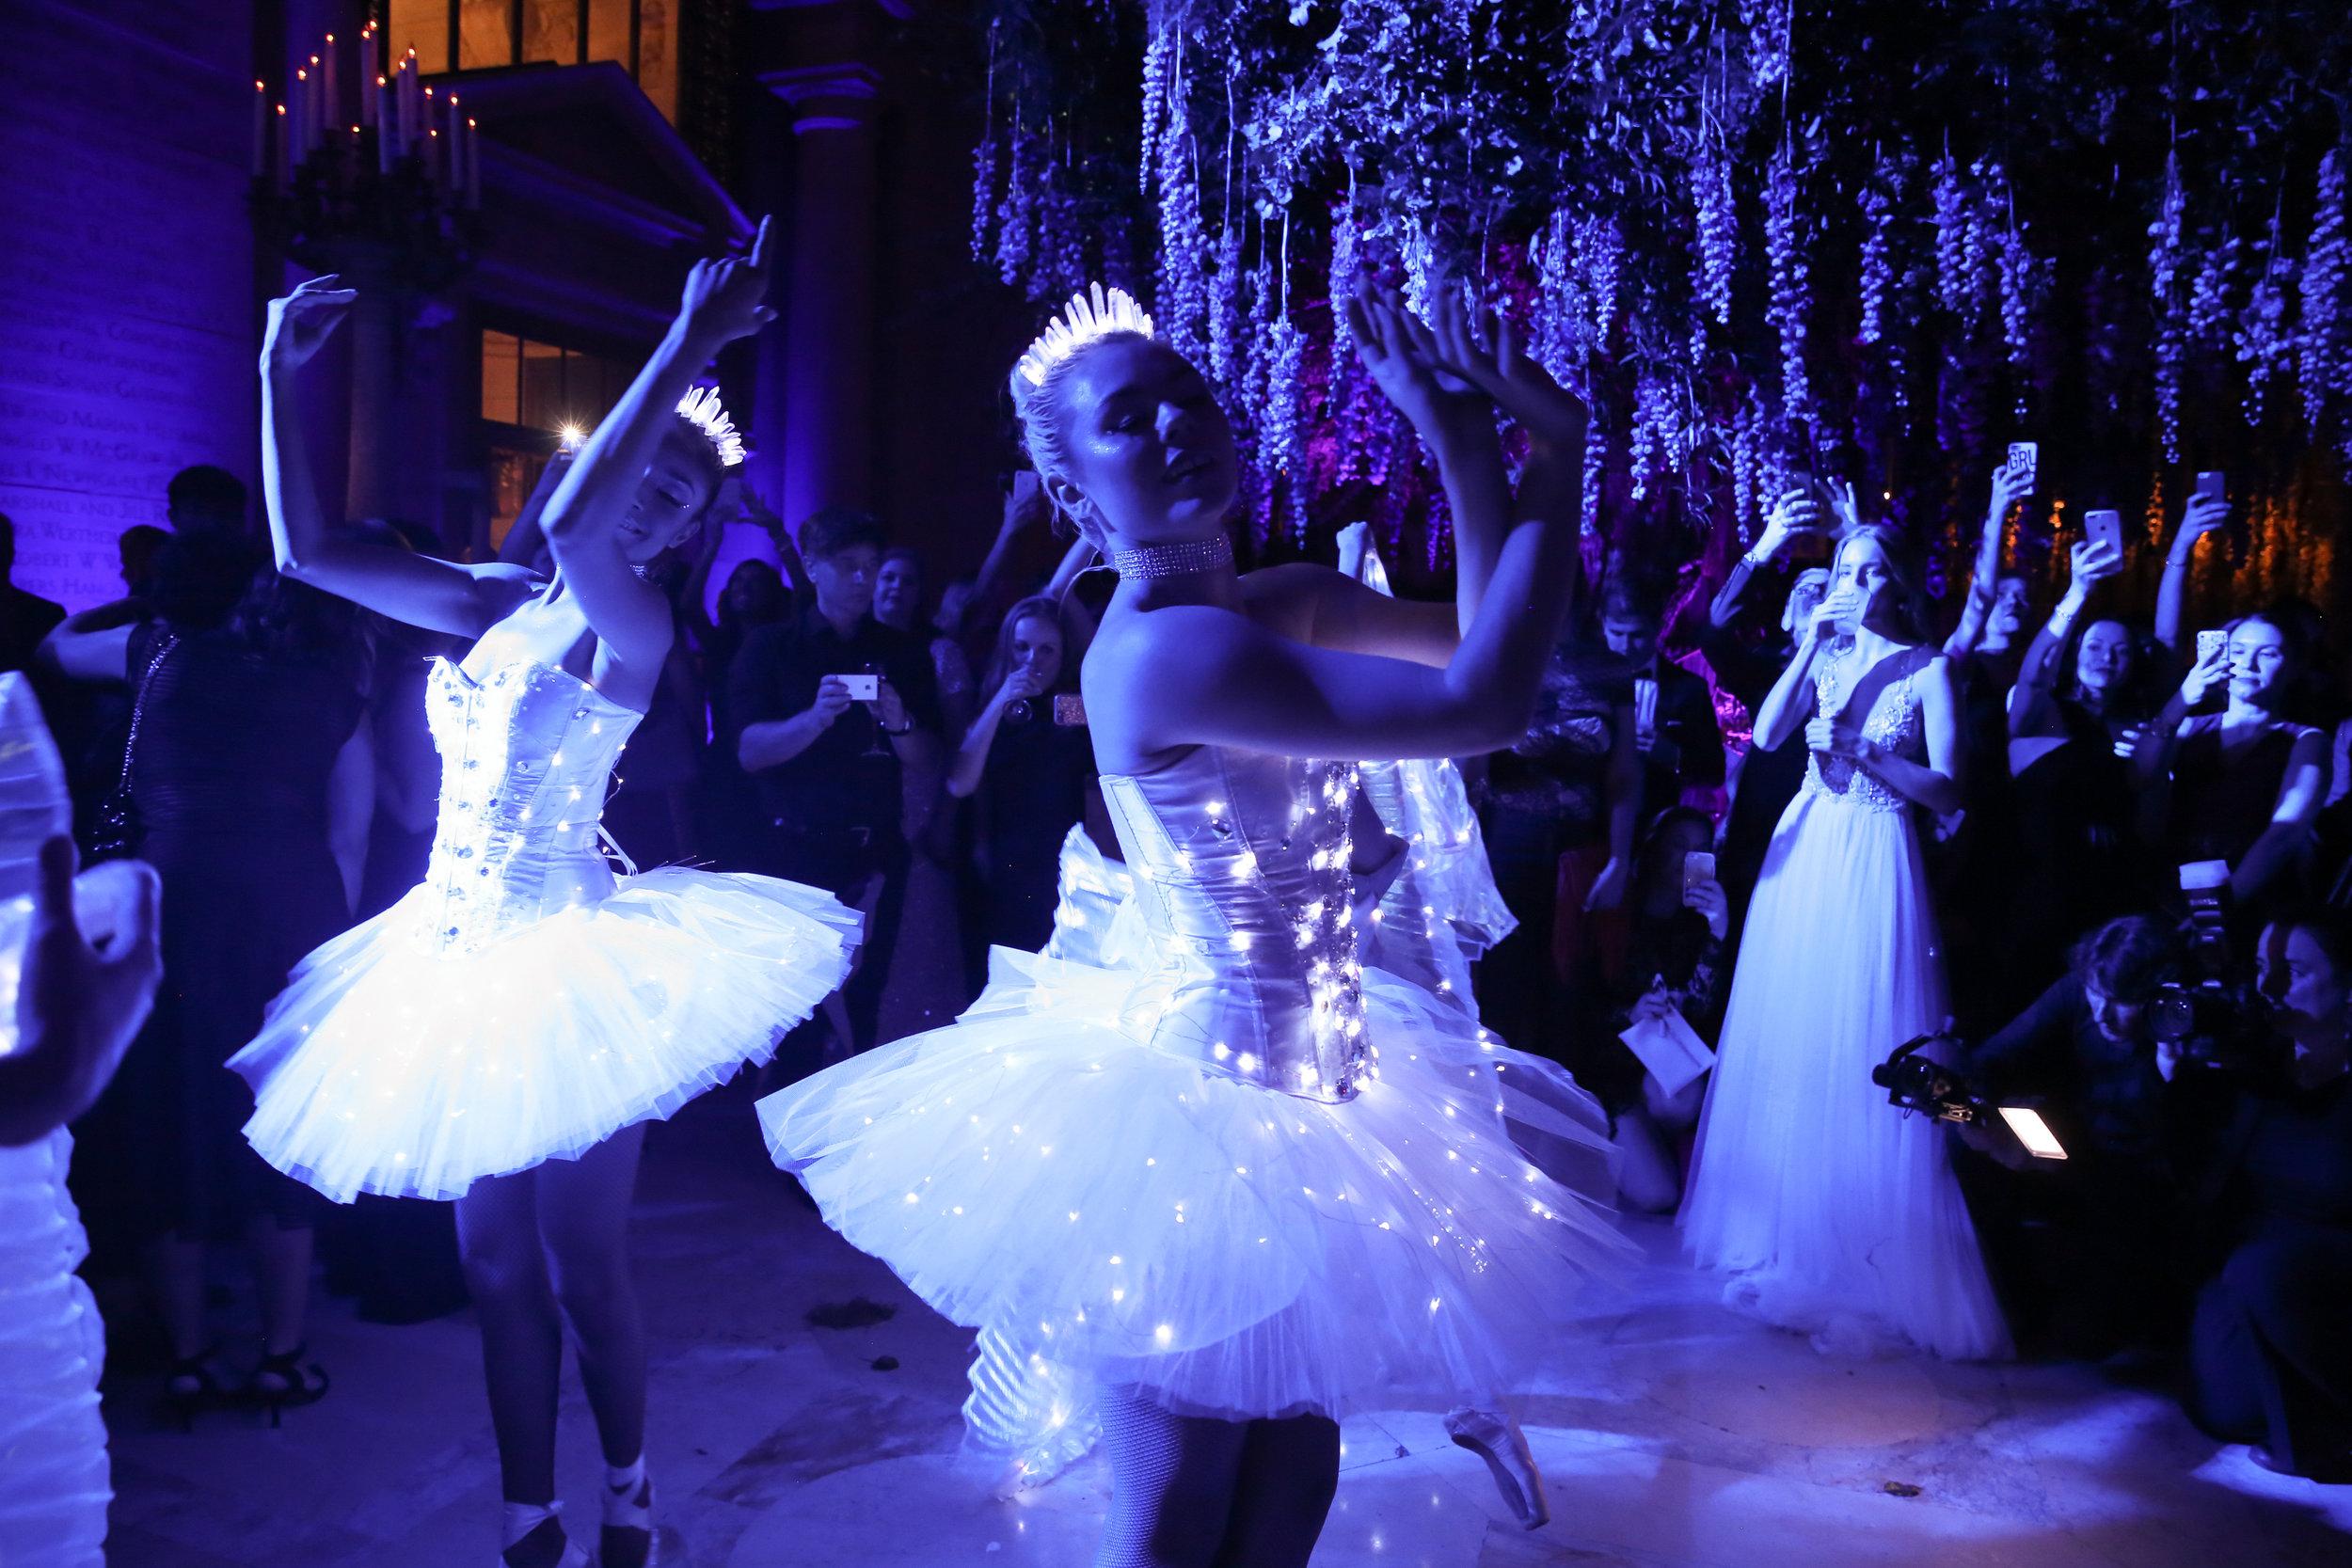 Illuminated Ballerinas / LED Dancers